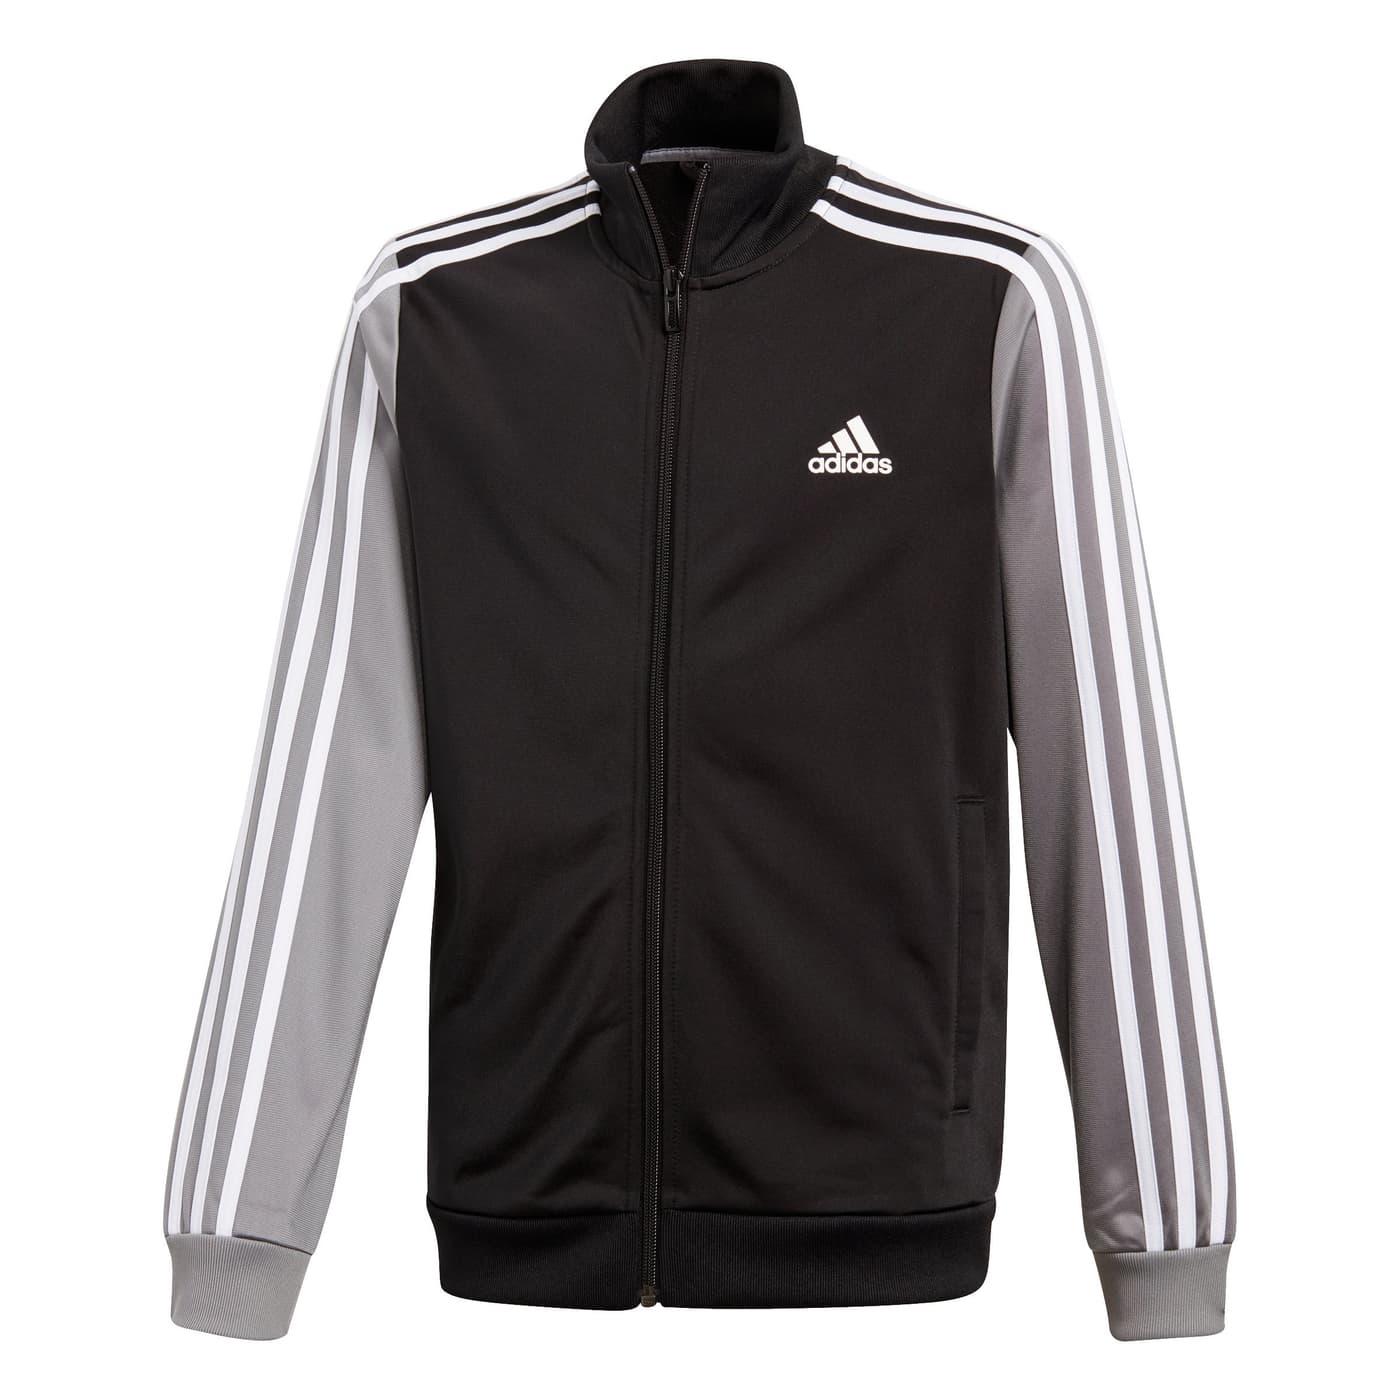 Adidas YB TIBERO TS CH Survêtement pour enfants